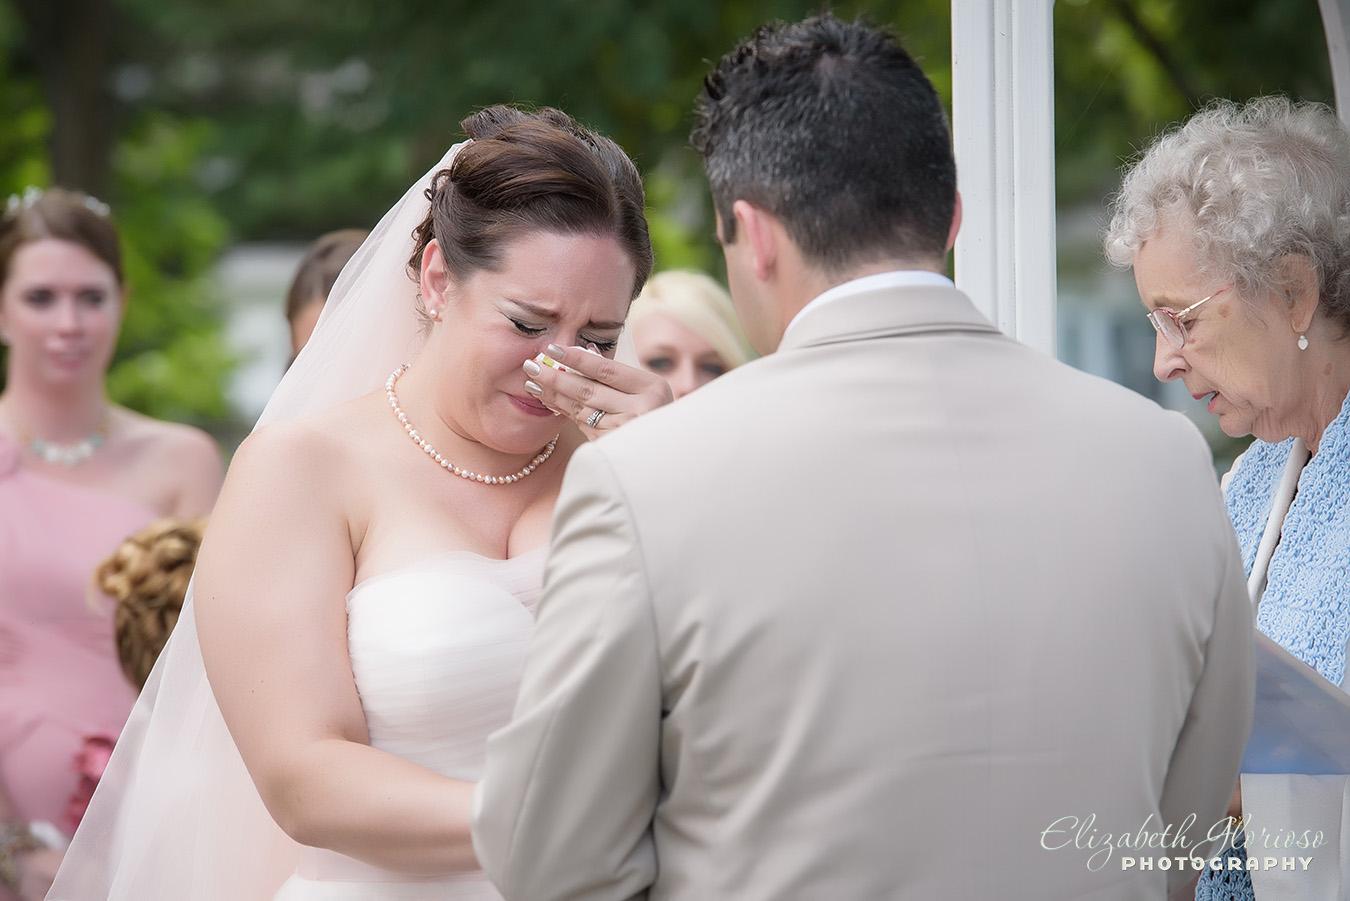 Vermilion_wedding_Glorioso Photography_1031